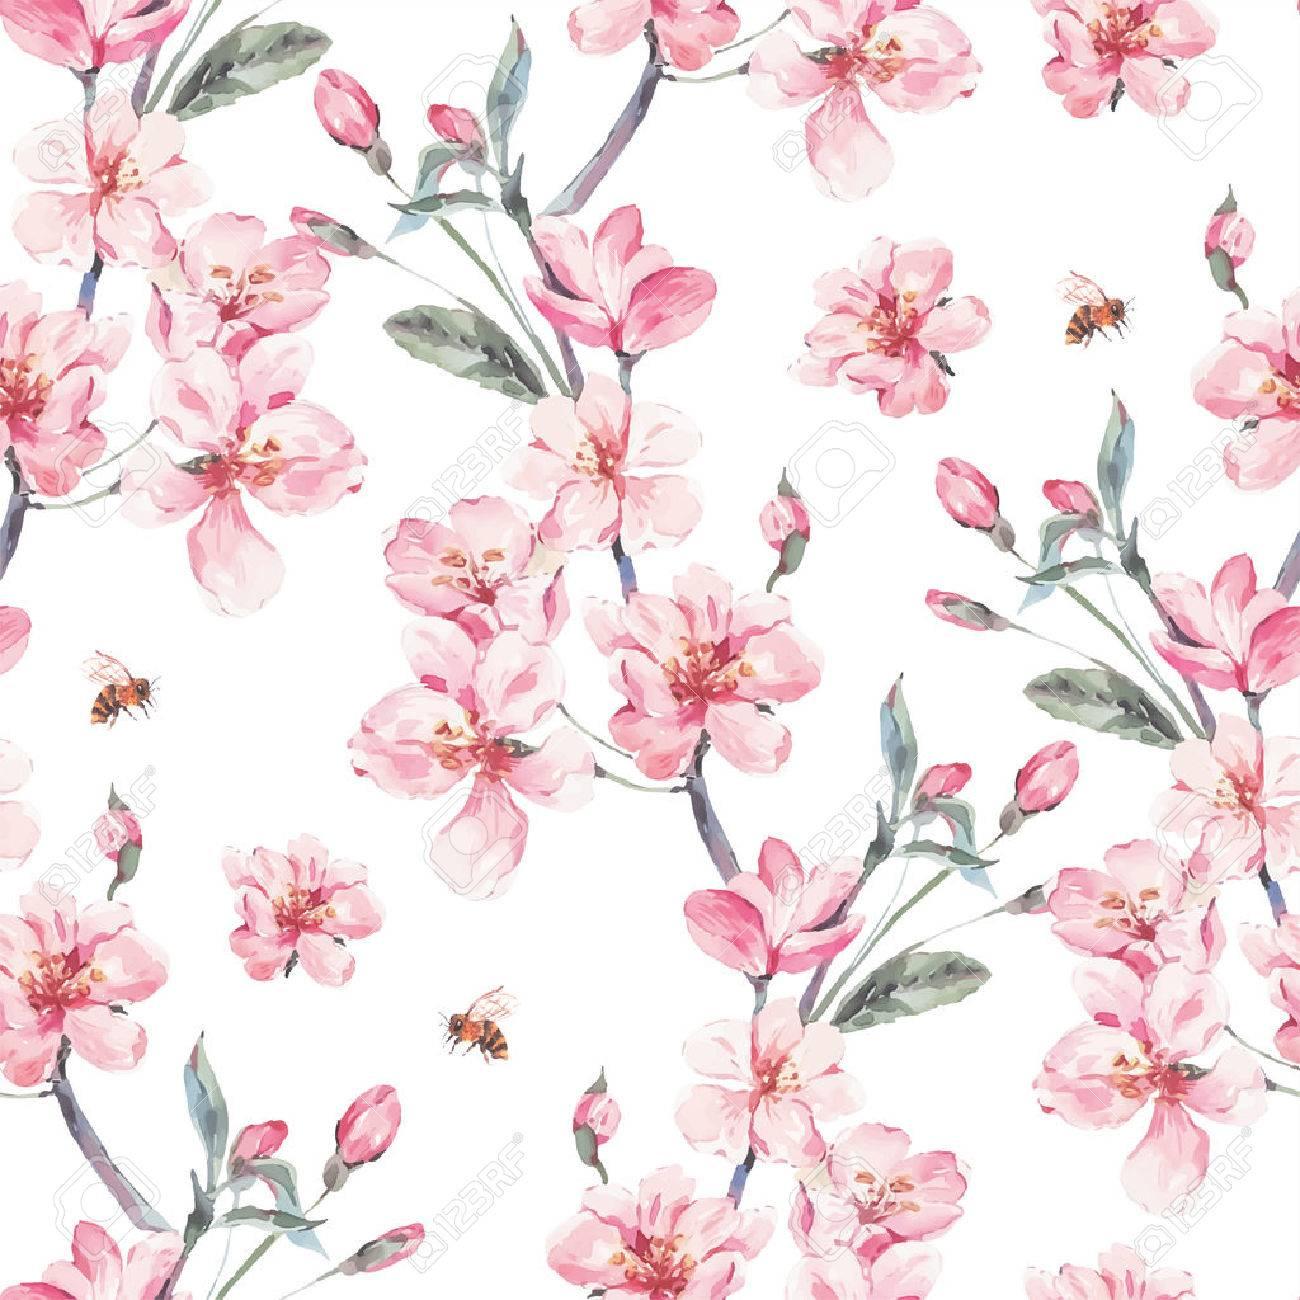 Vintage garden vector spring seamless background - 69497705